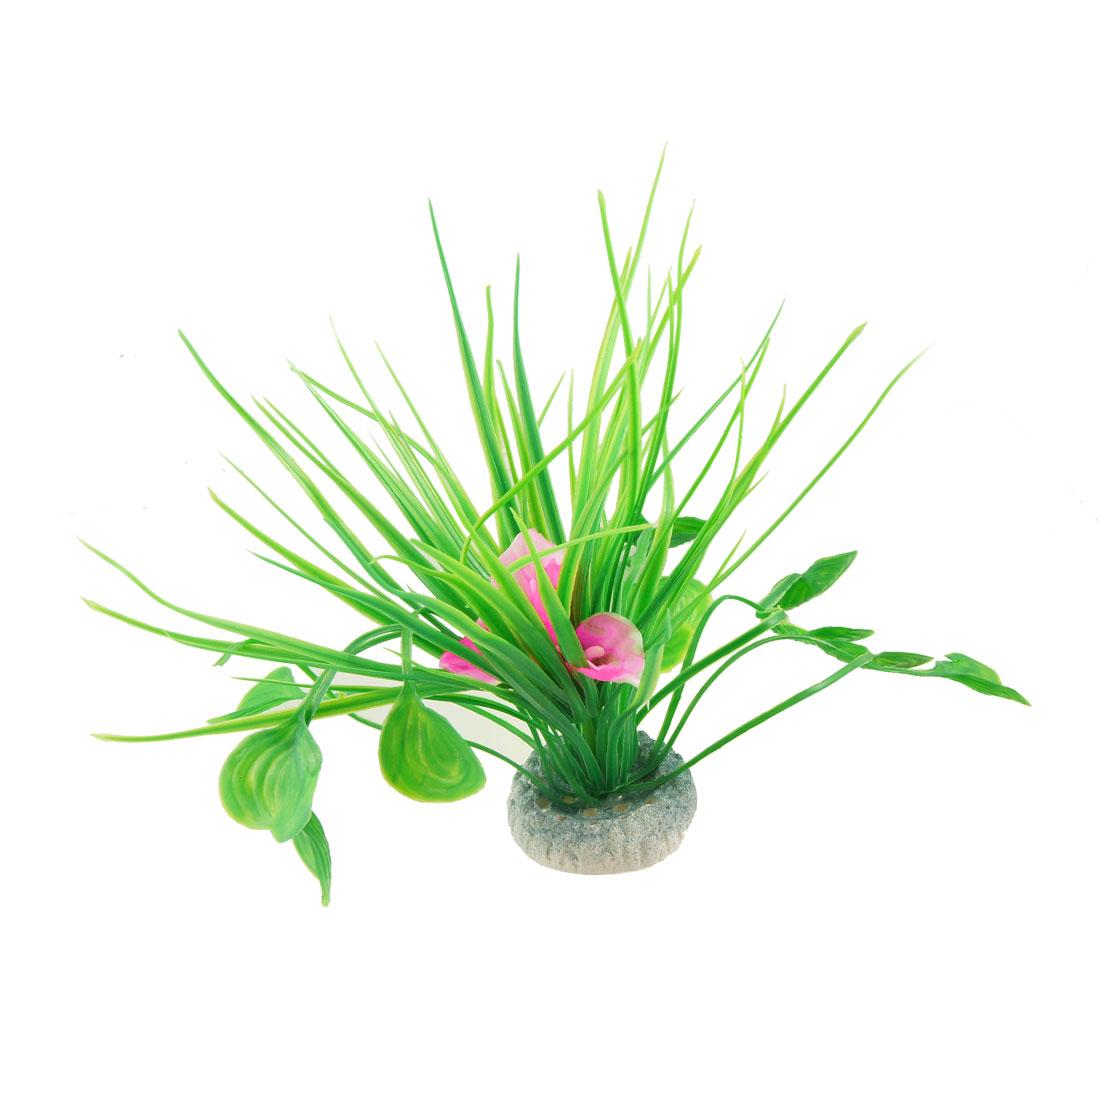 Fish Tank White Pink Flower Green Leaf Plant Grass Decor